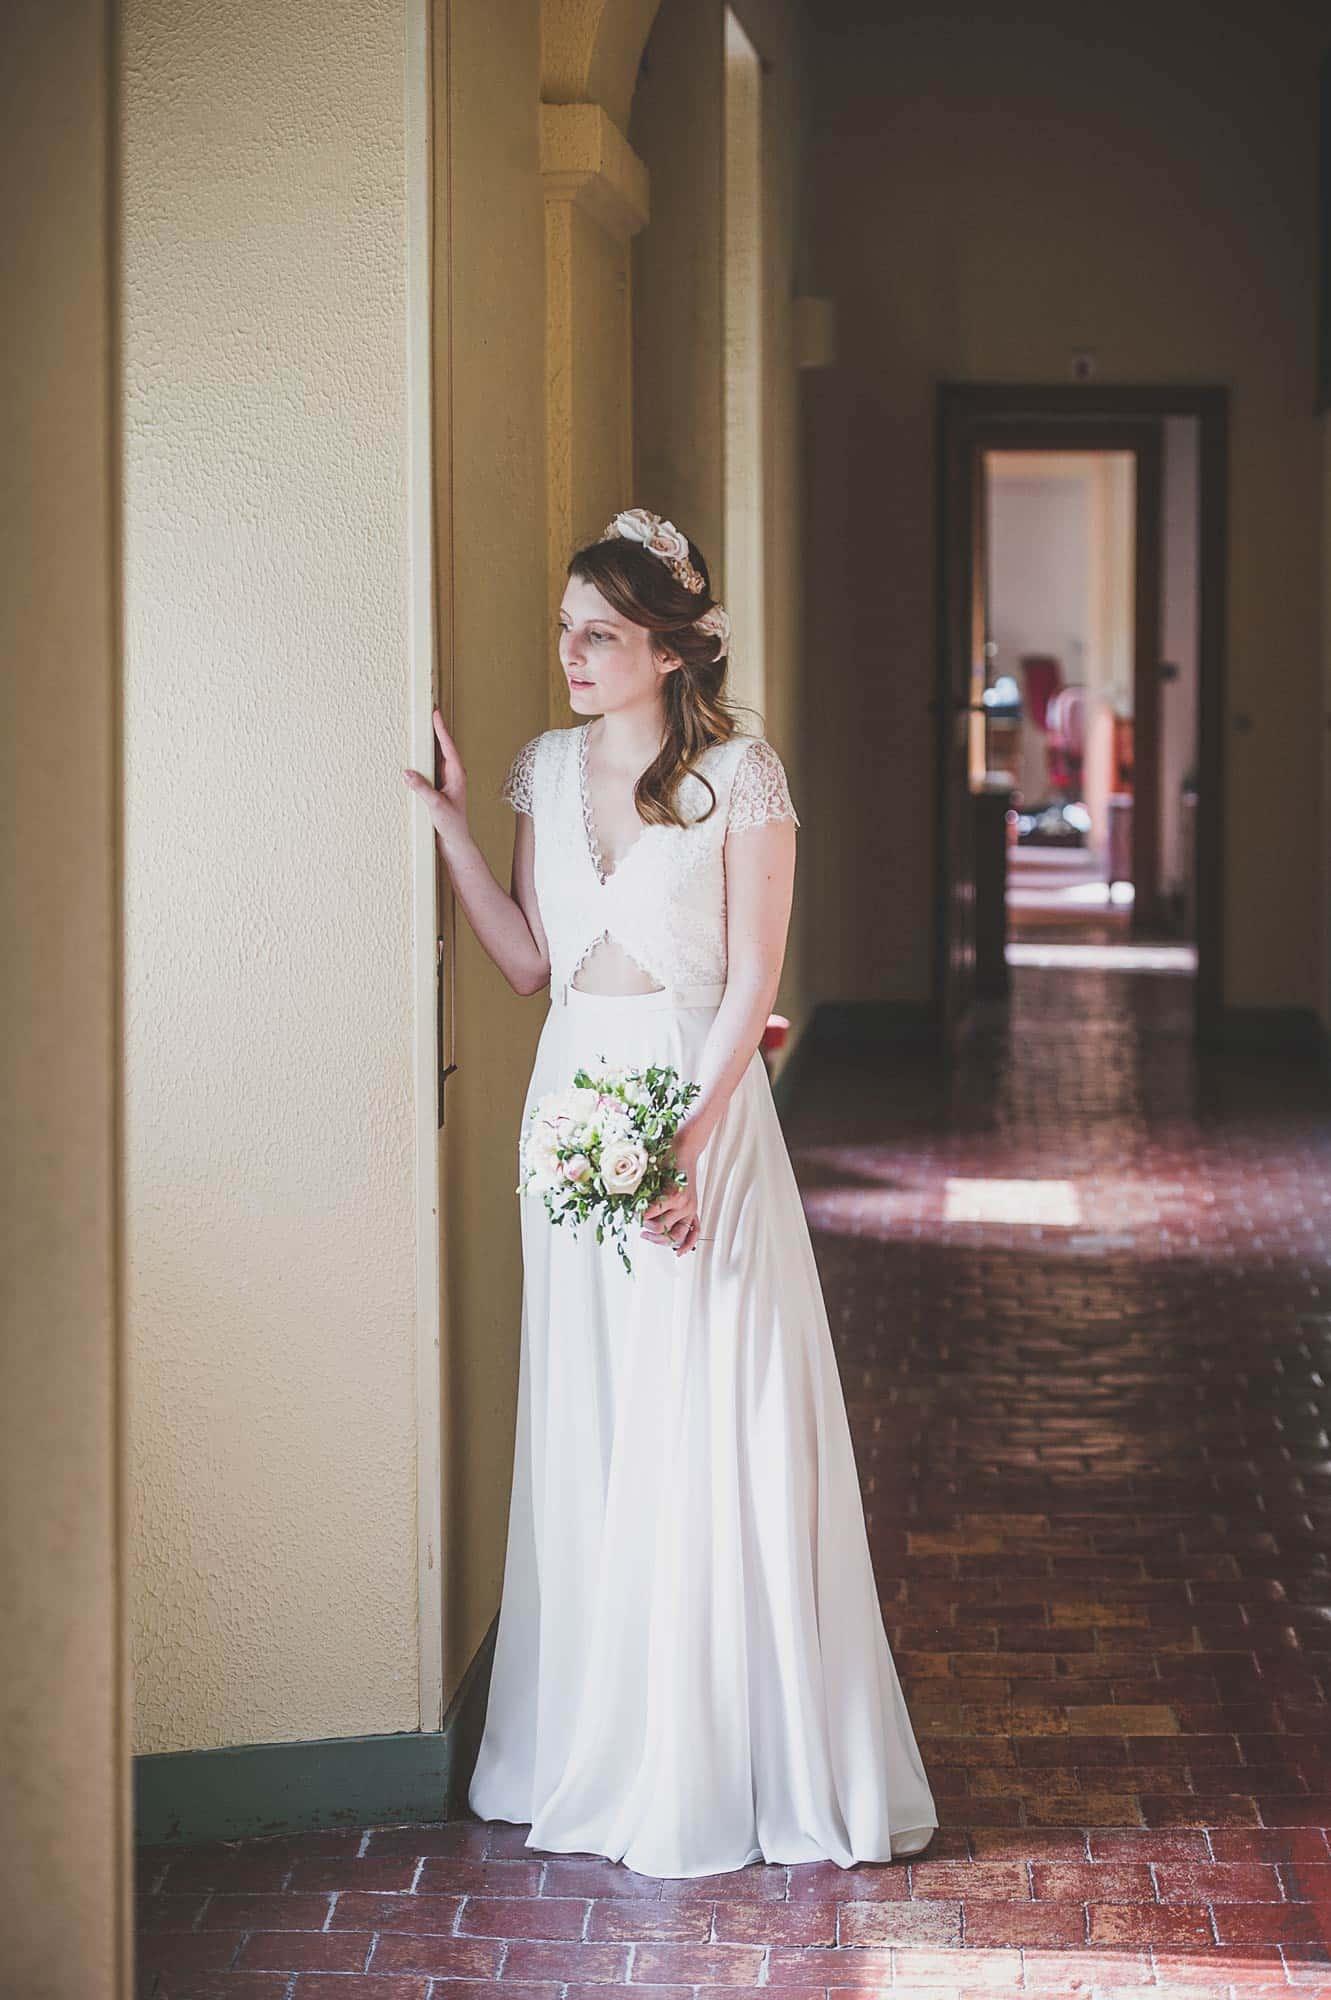 photographe mariage Bordeaux - 3